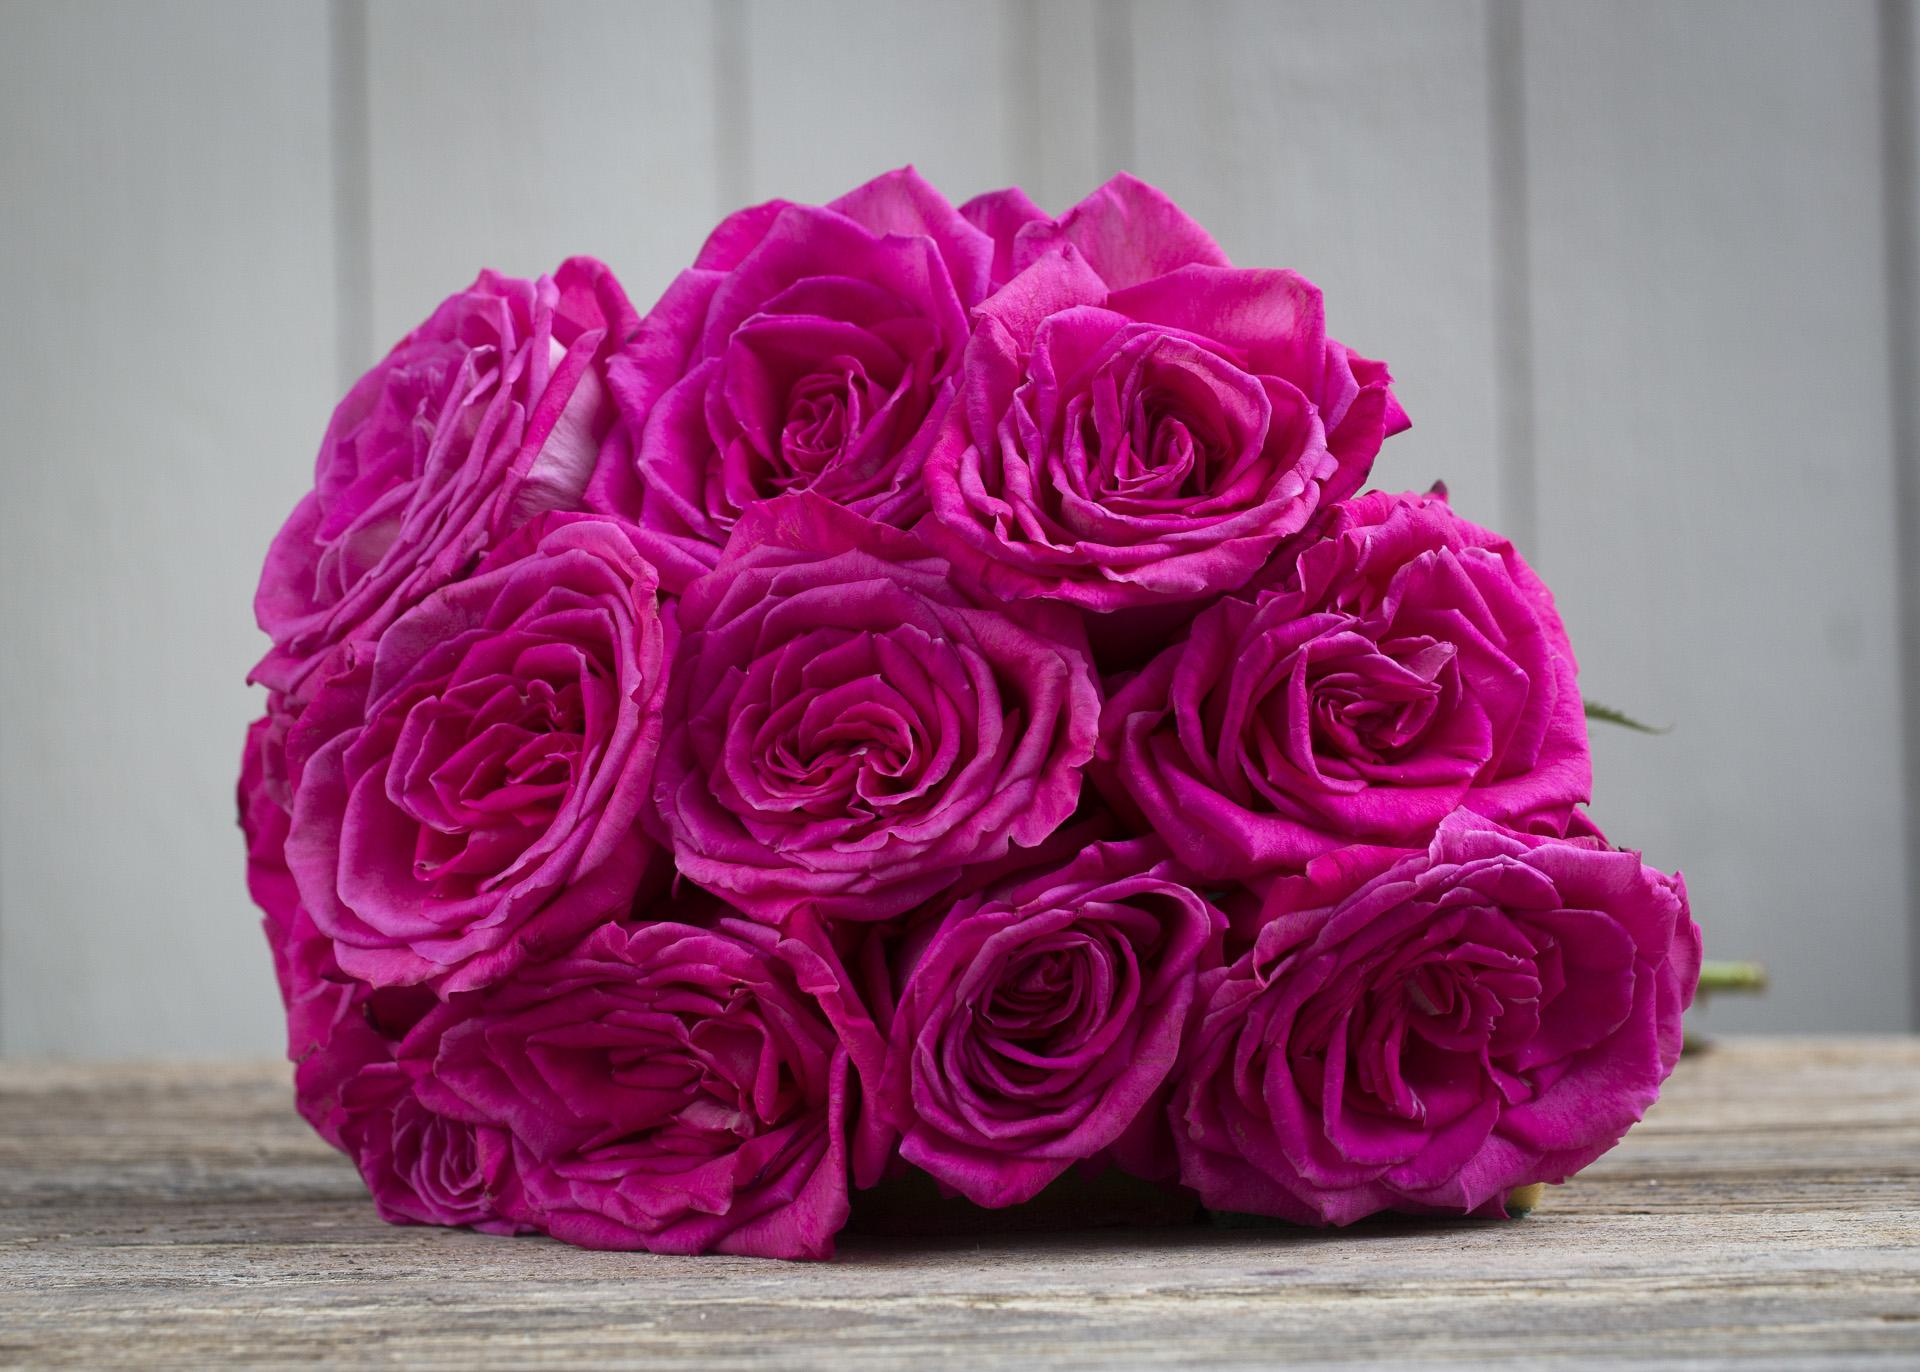 Lolita Lempicka scented roses